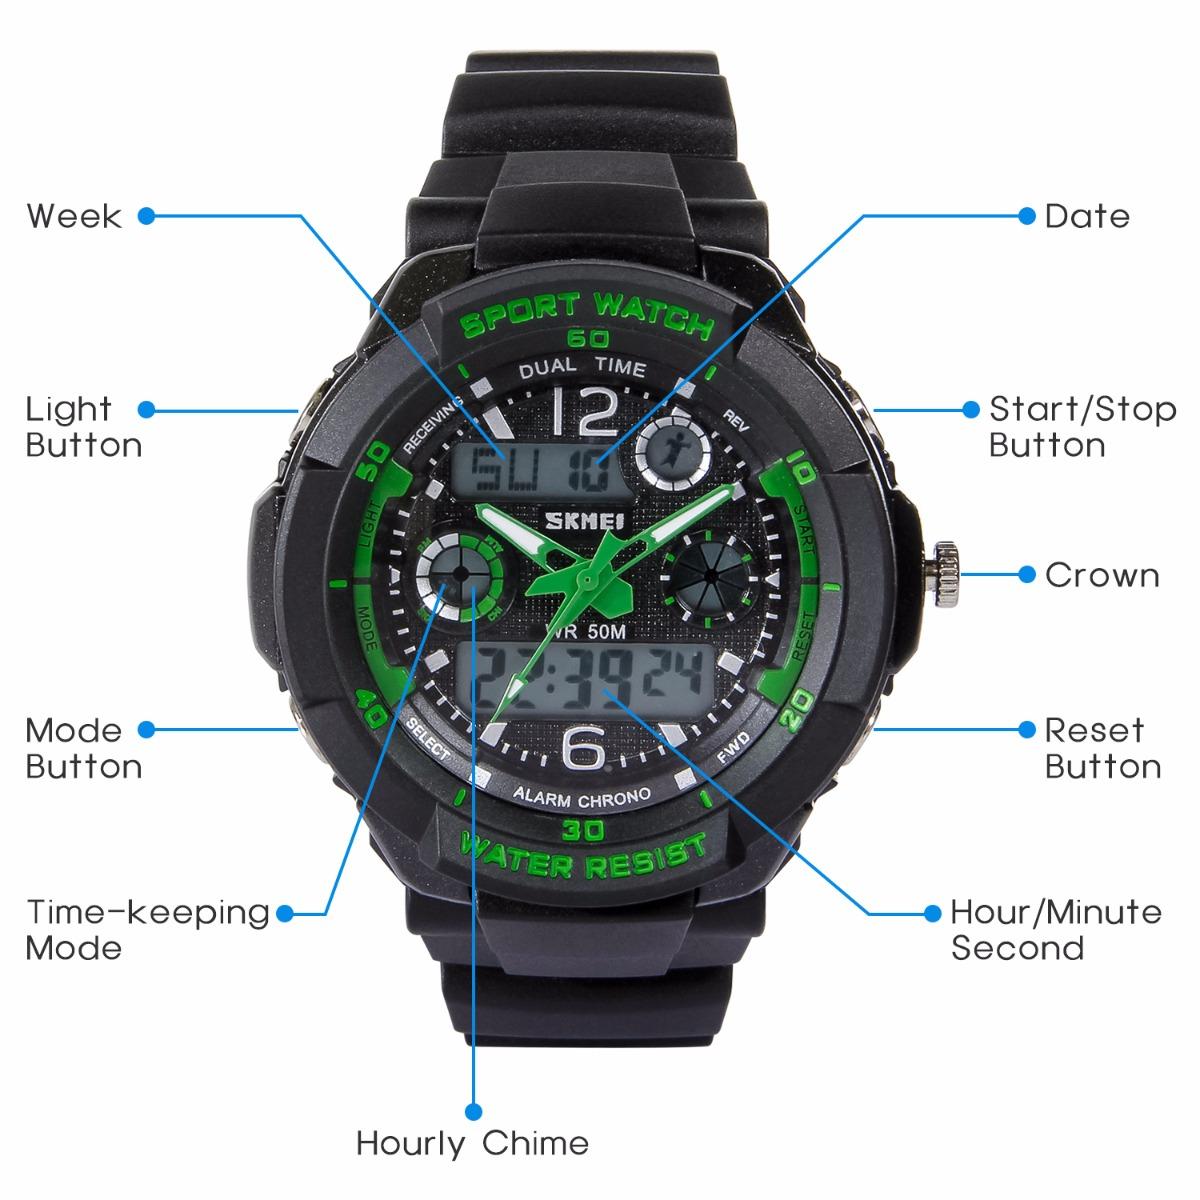 4616ec1328d Hiwatch Kids Watches Boys Girls Waterproof Sports Digital Wrist Watch for  Youth